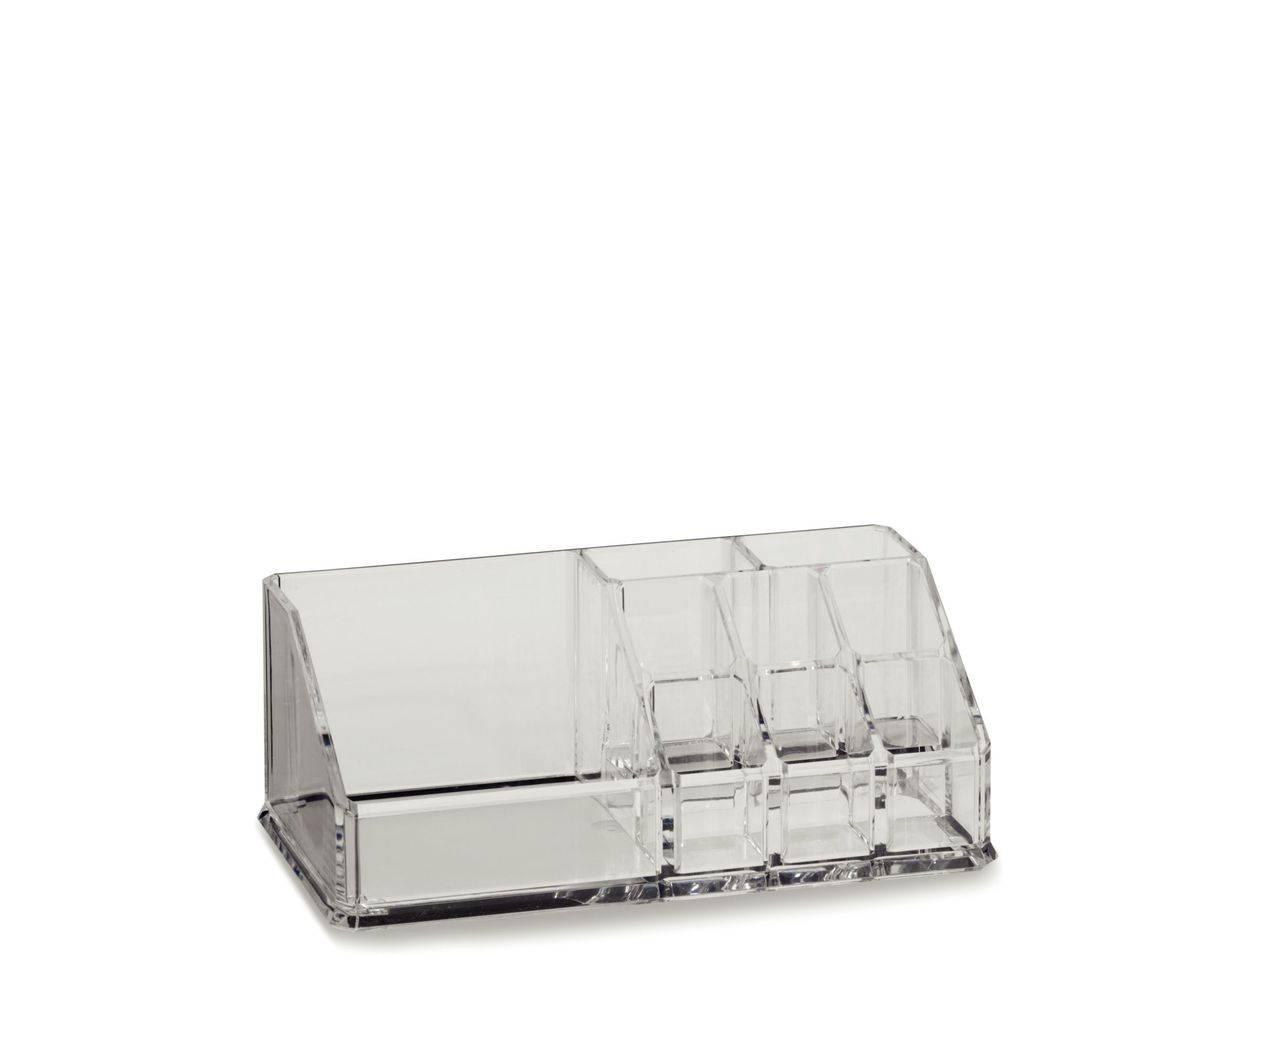 Kosmetická dóza SAFIRA plast, transparent, 17,5x9,5x6,5cm - Kela